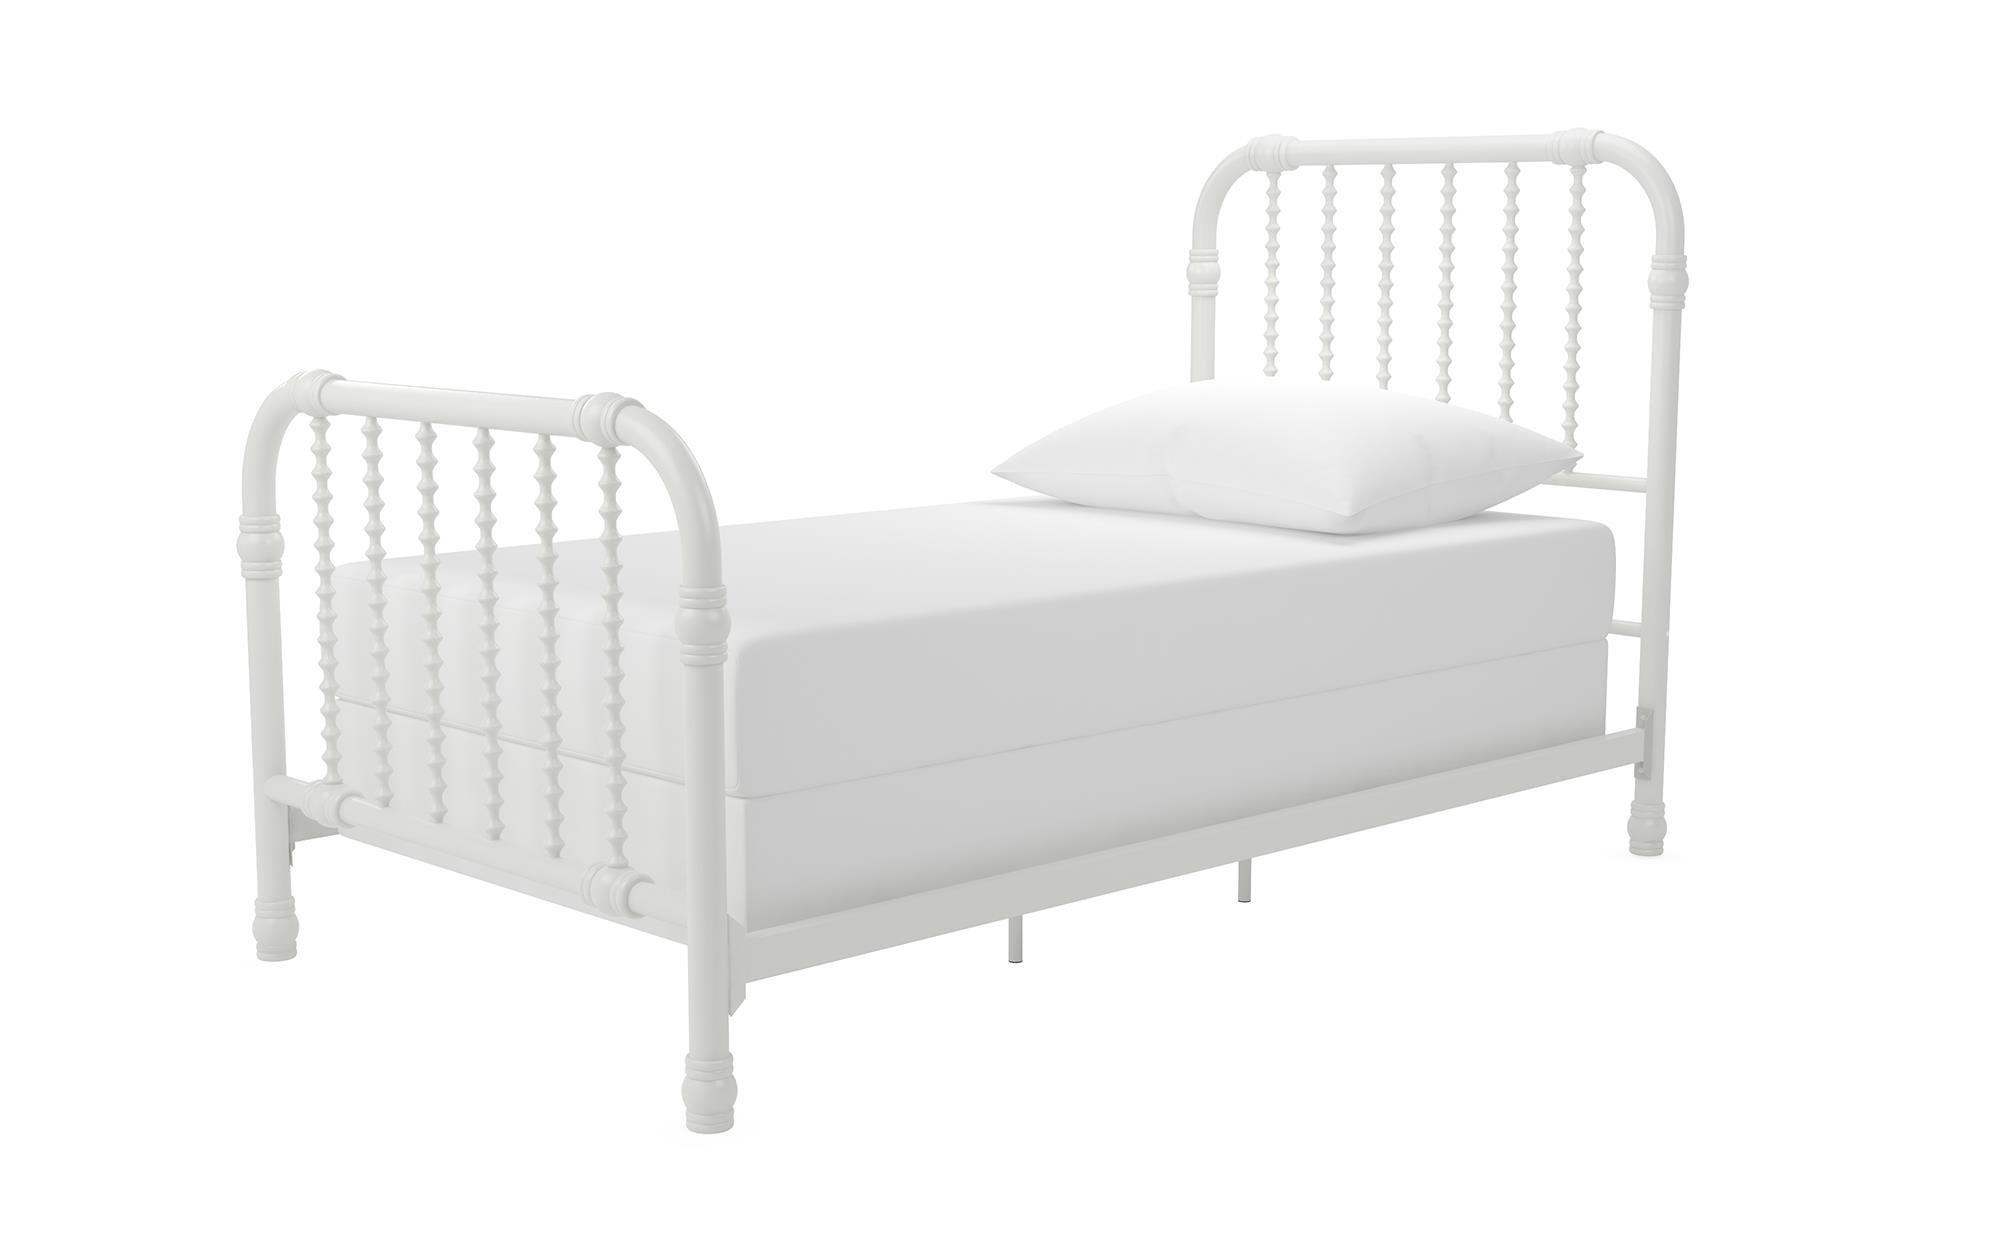 Little Seeds Monarch Hill Wren Metal Bed Twin, White by Little Seeds